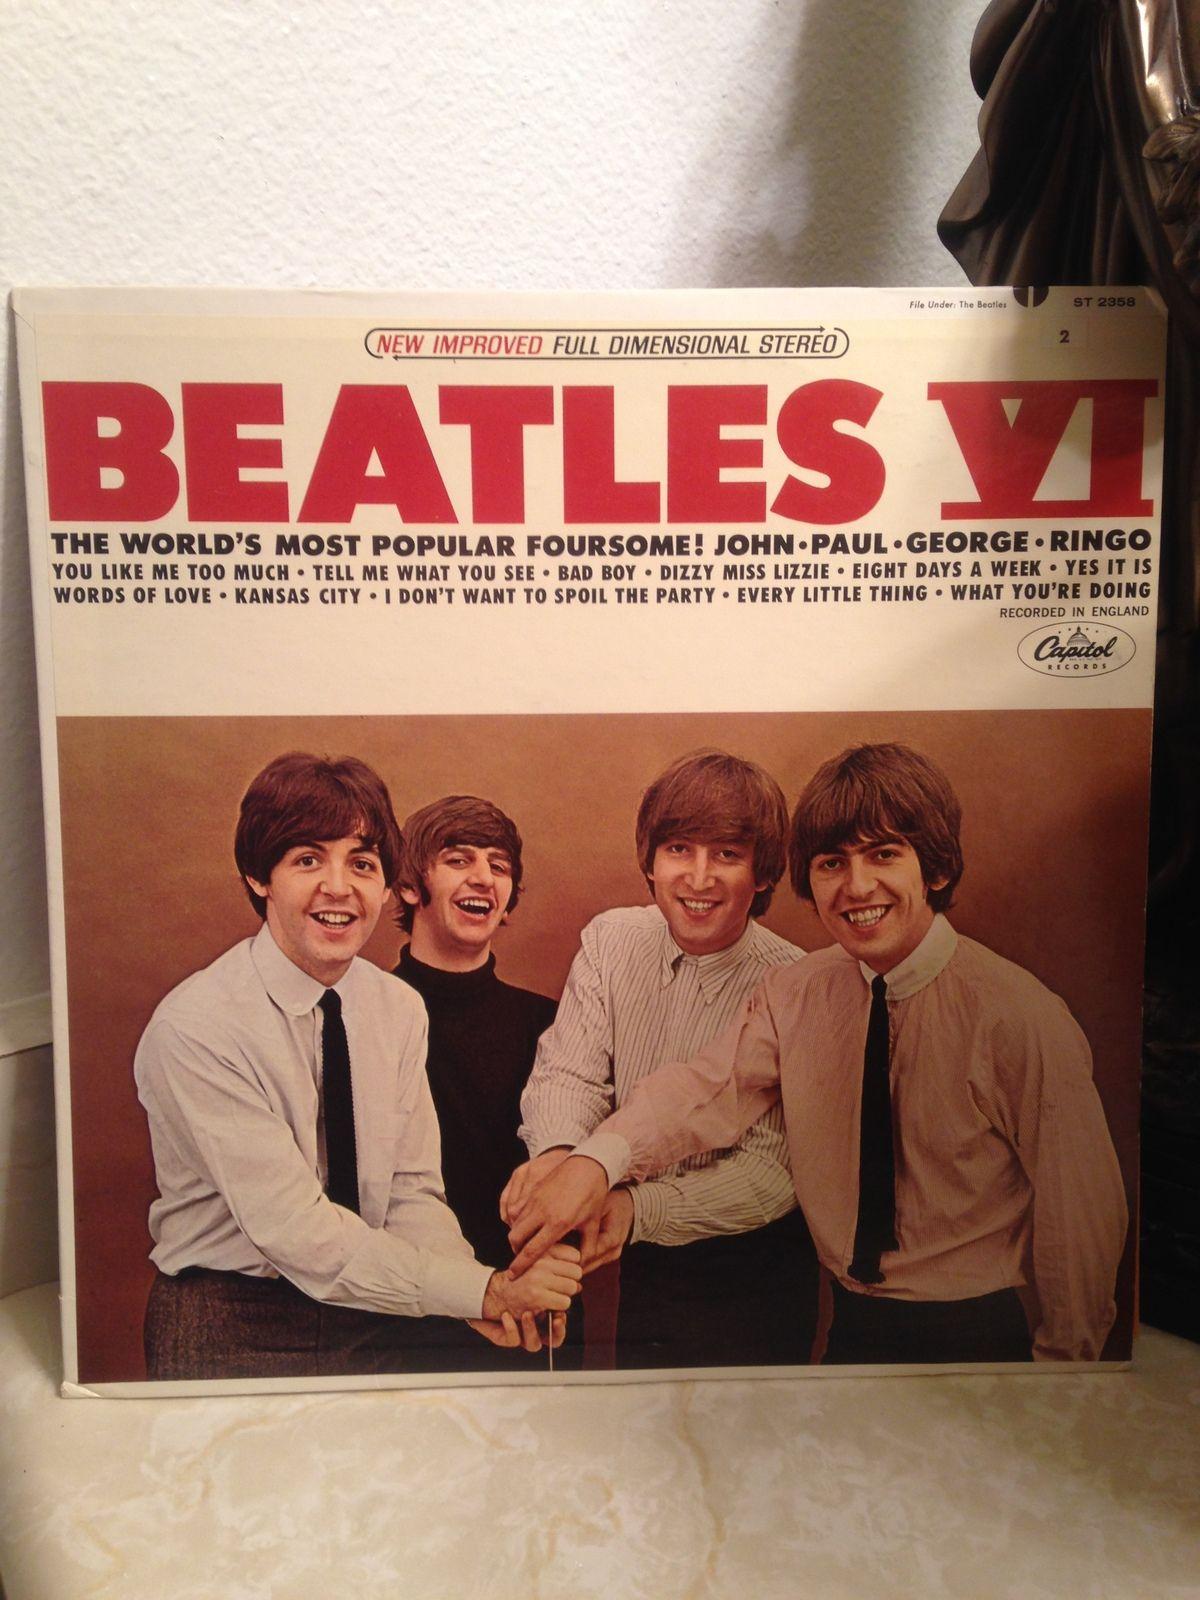 The beatles vi capitol records st record album beatles